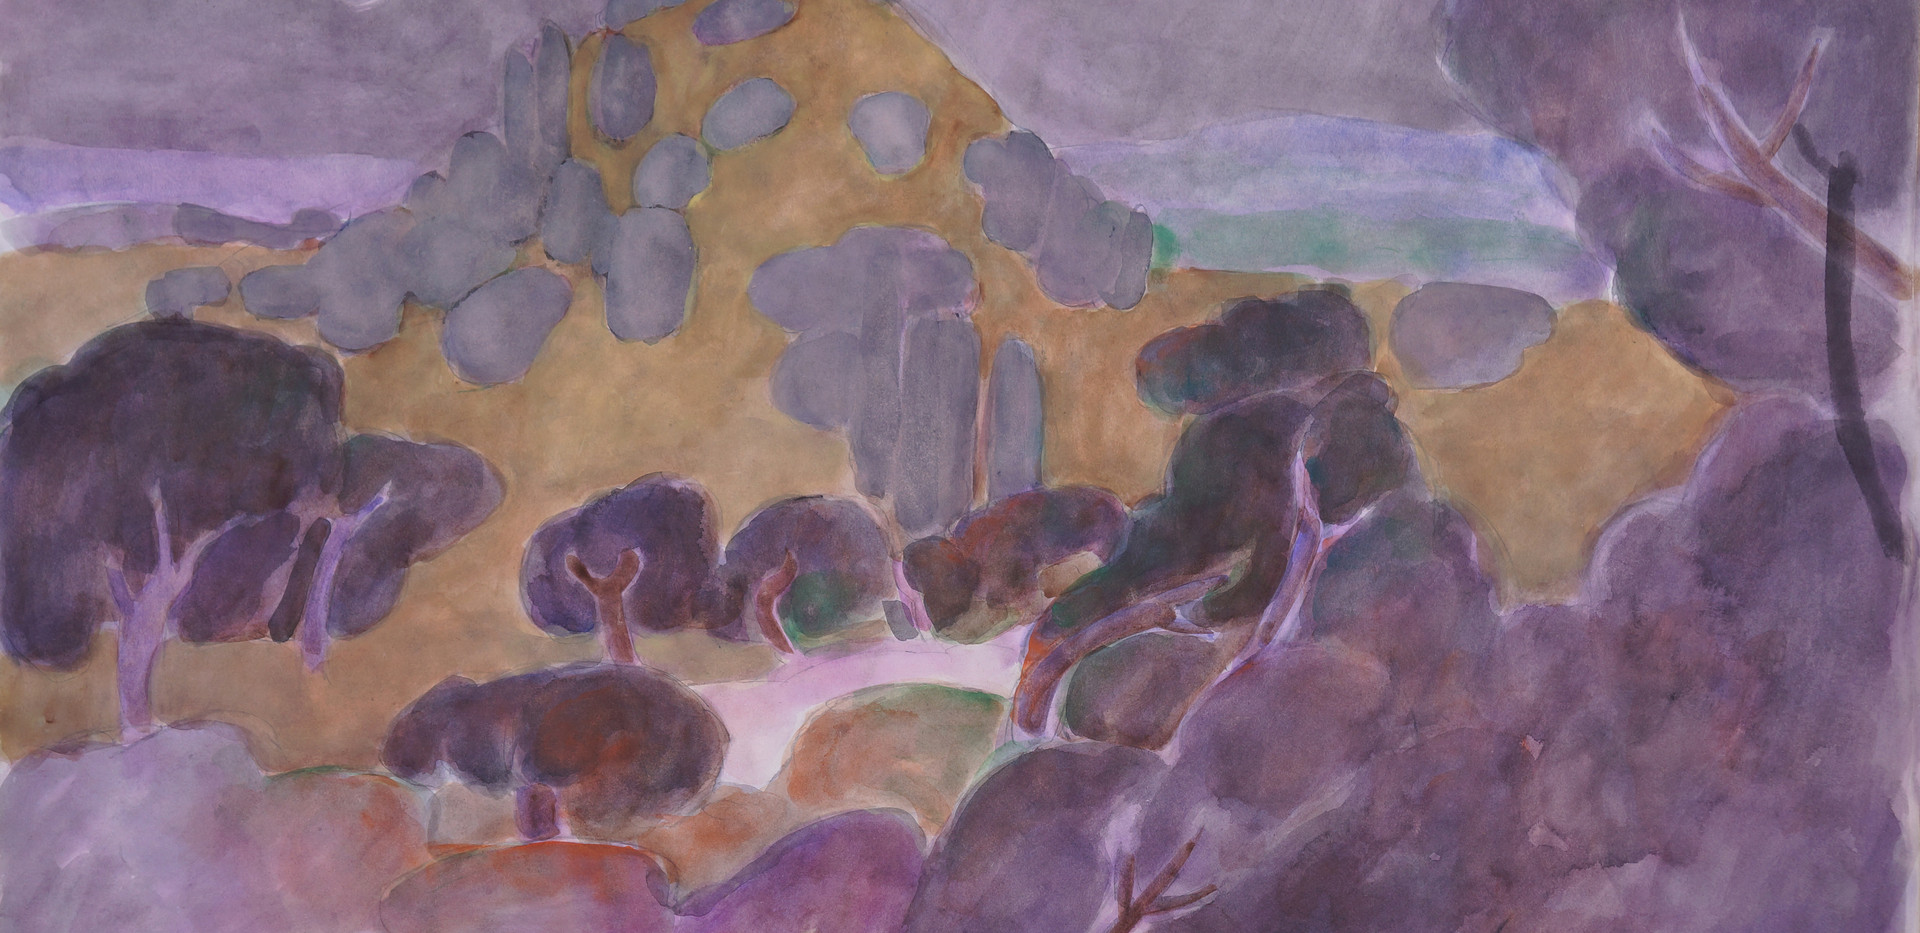 Ali Golestaneh Talaghan Gouache on paper 100 x 70 cm 2006